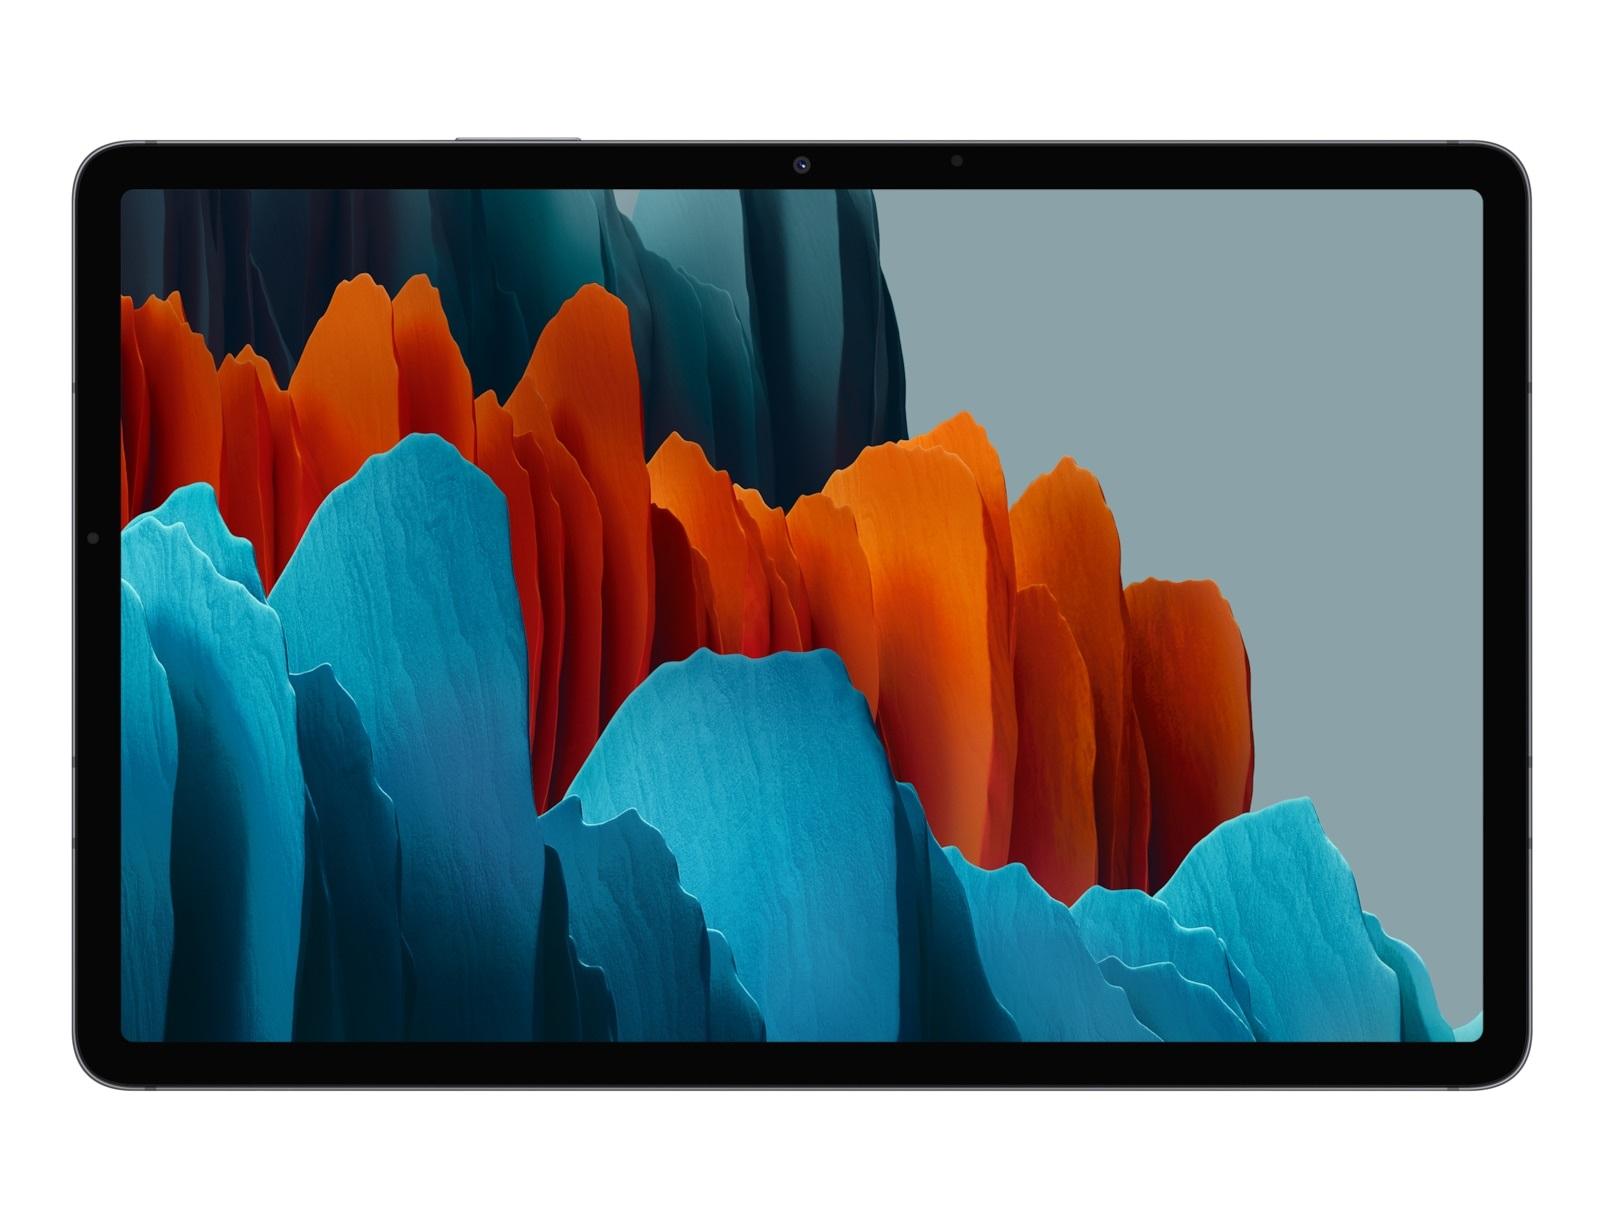 Samsung GalaxyTab S7 11